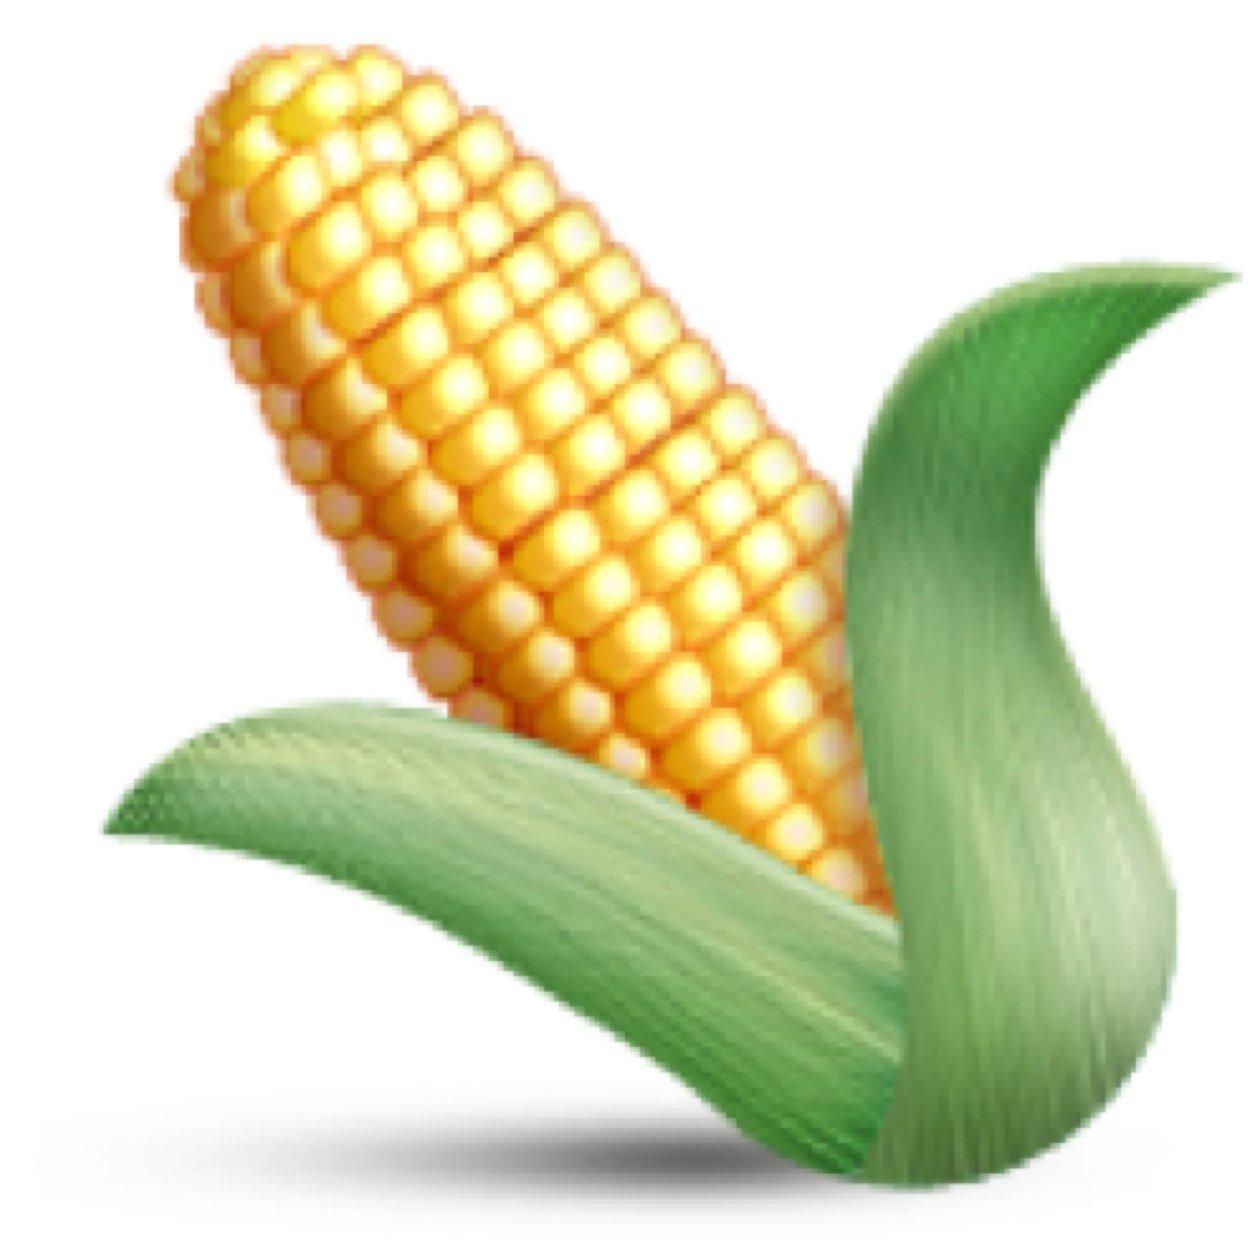 corn emoji   thecornemoji  twitter Fruit and Vegetable Border Clip Art Basket of Fruits and Vegetables